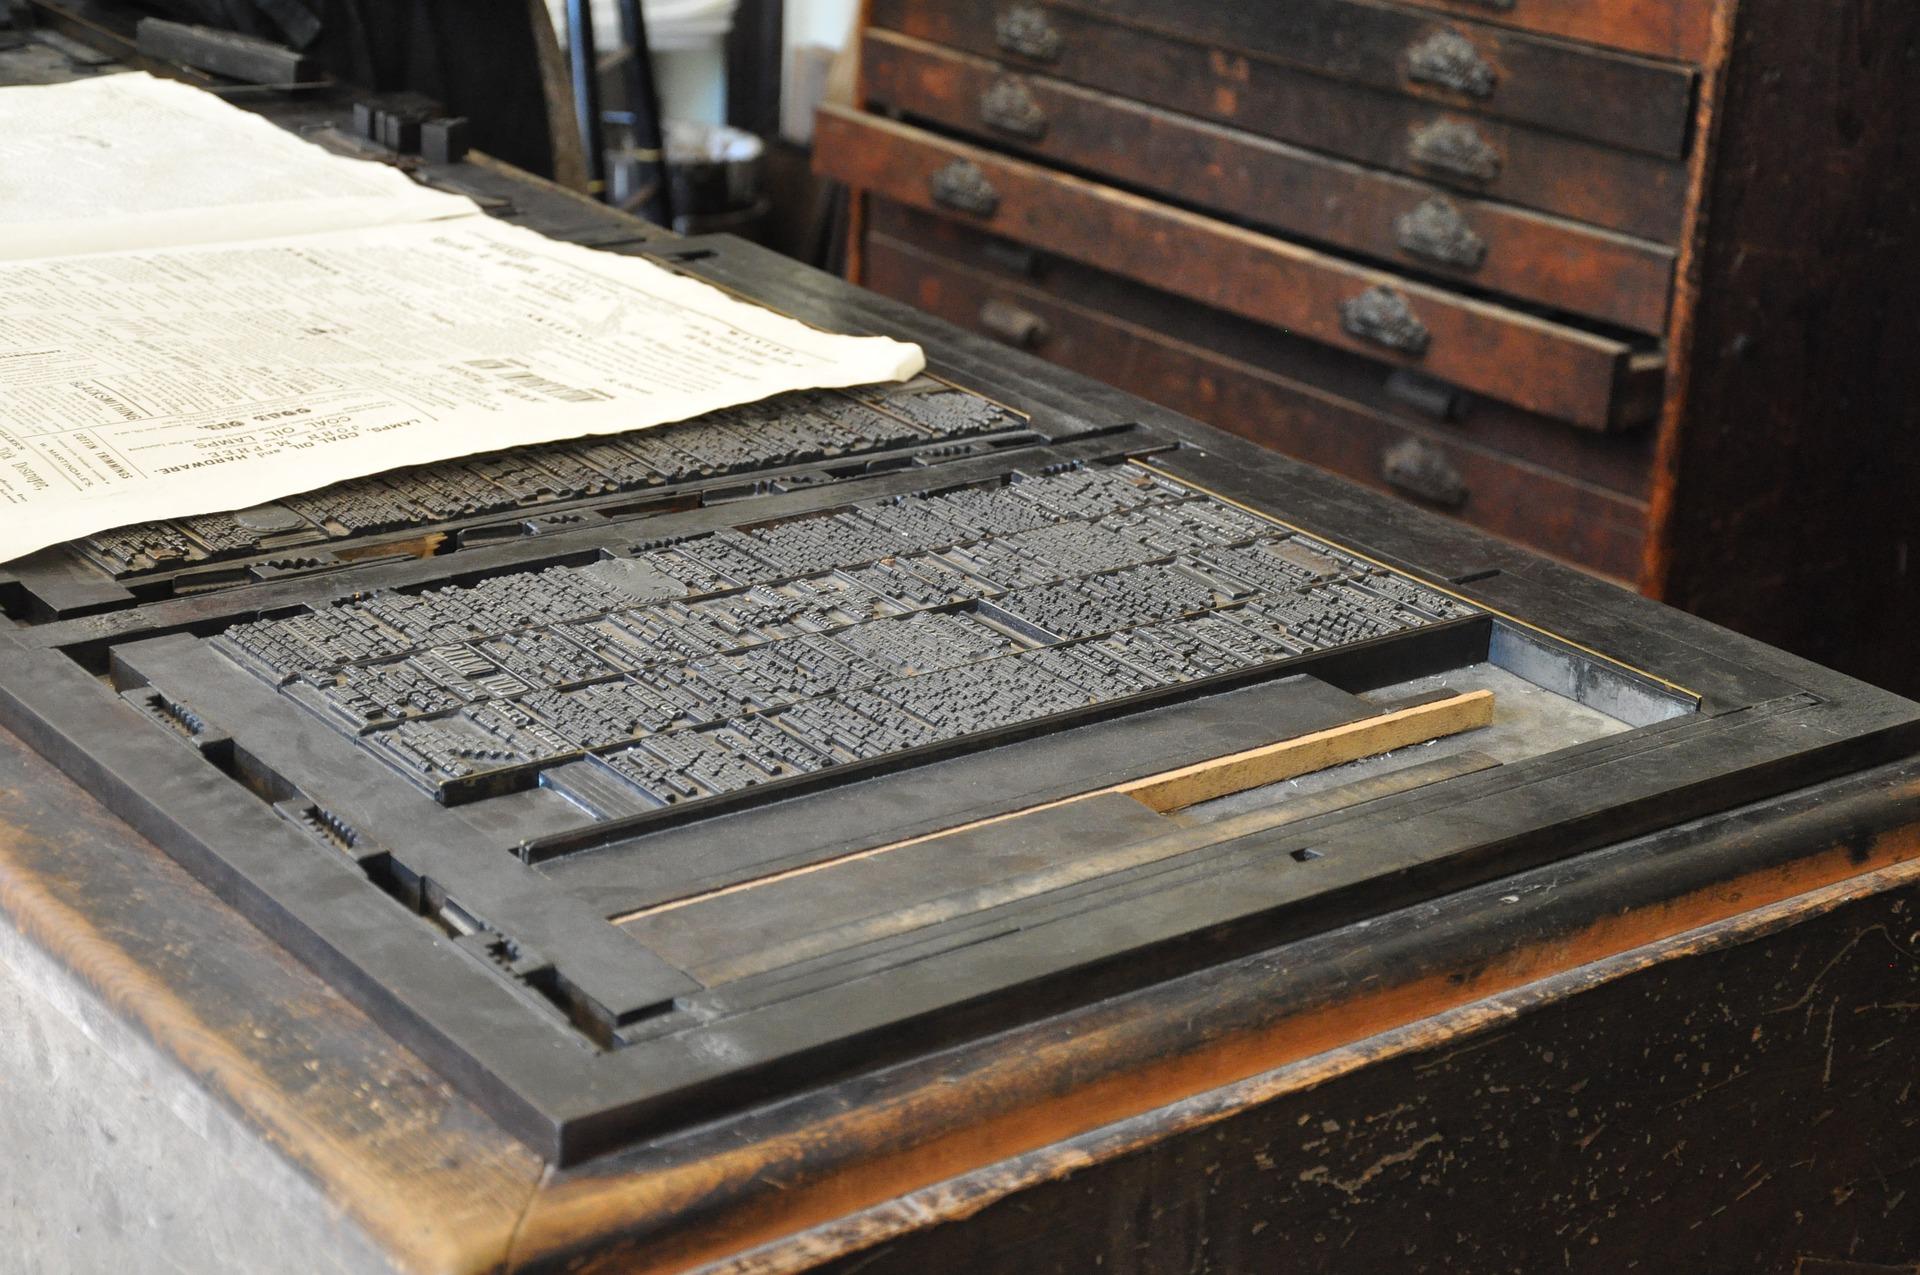 old-print-press-1520124_1920